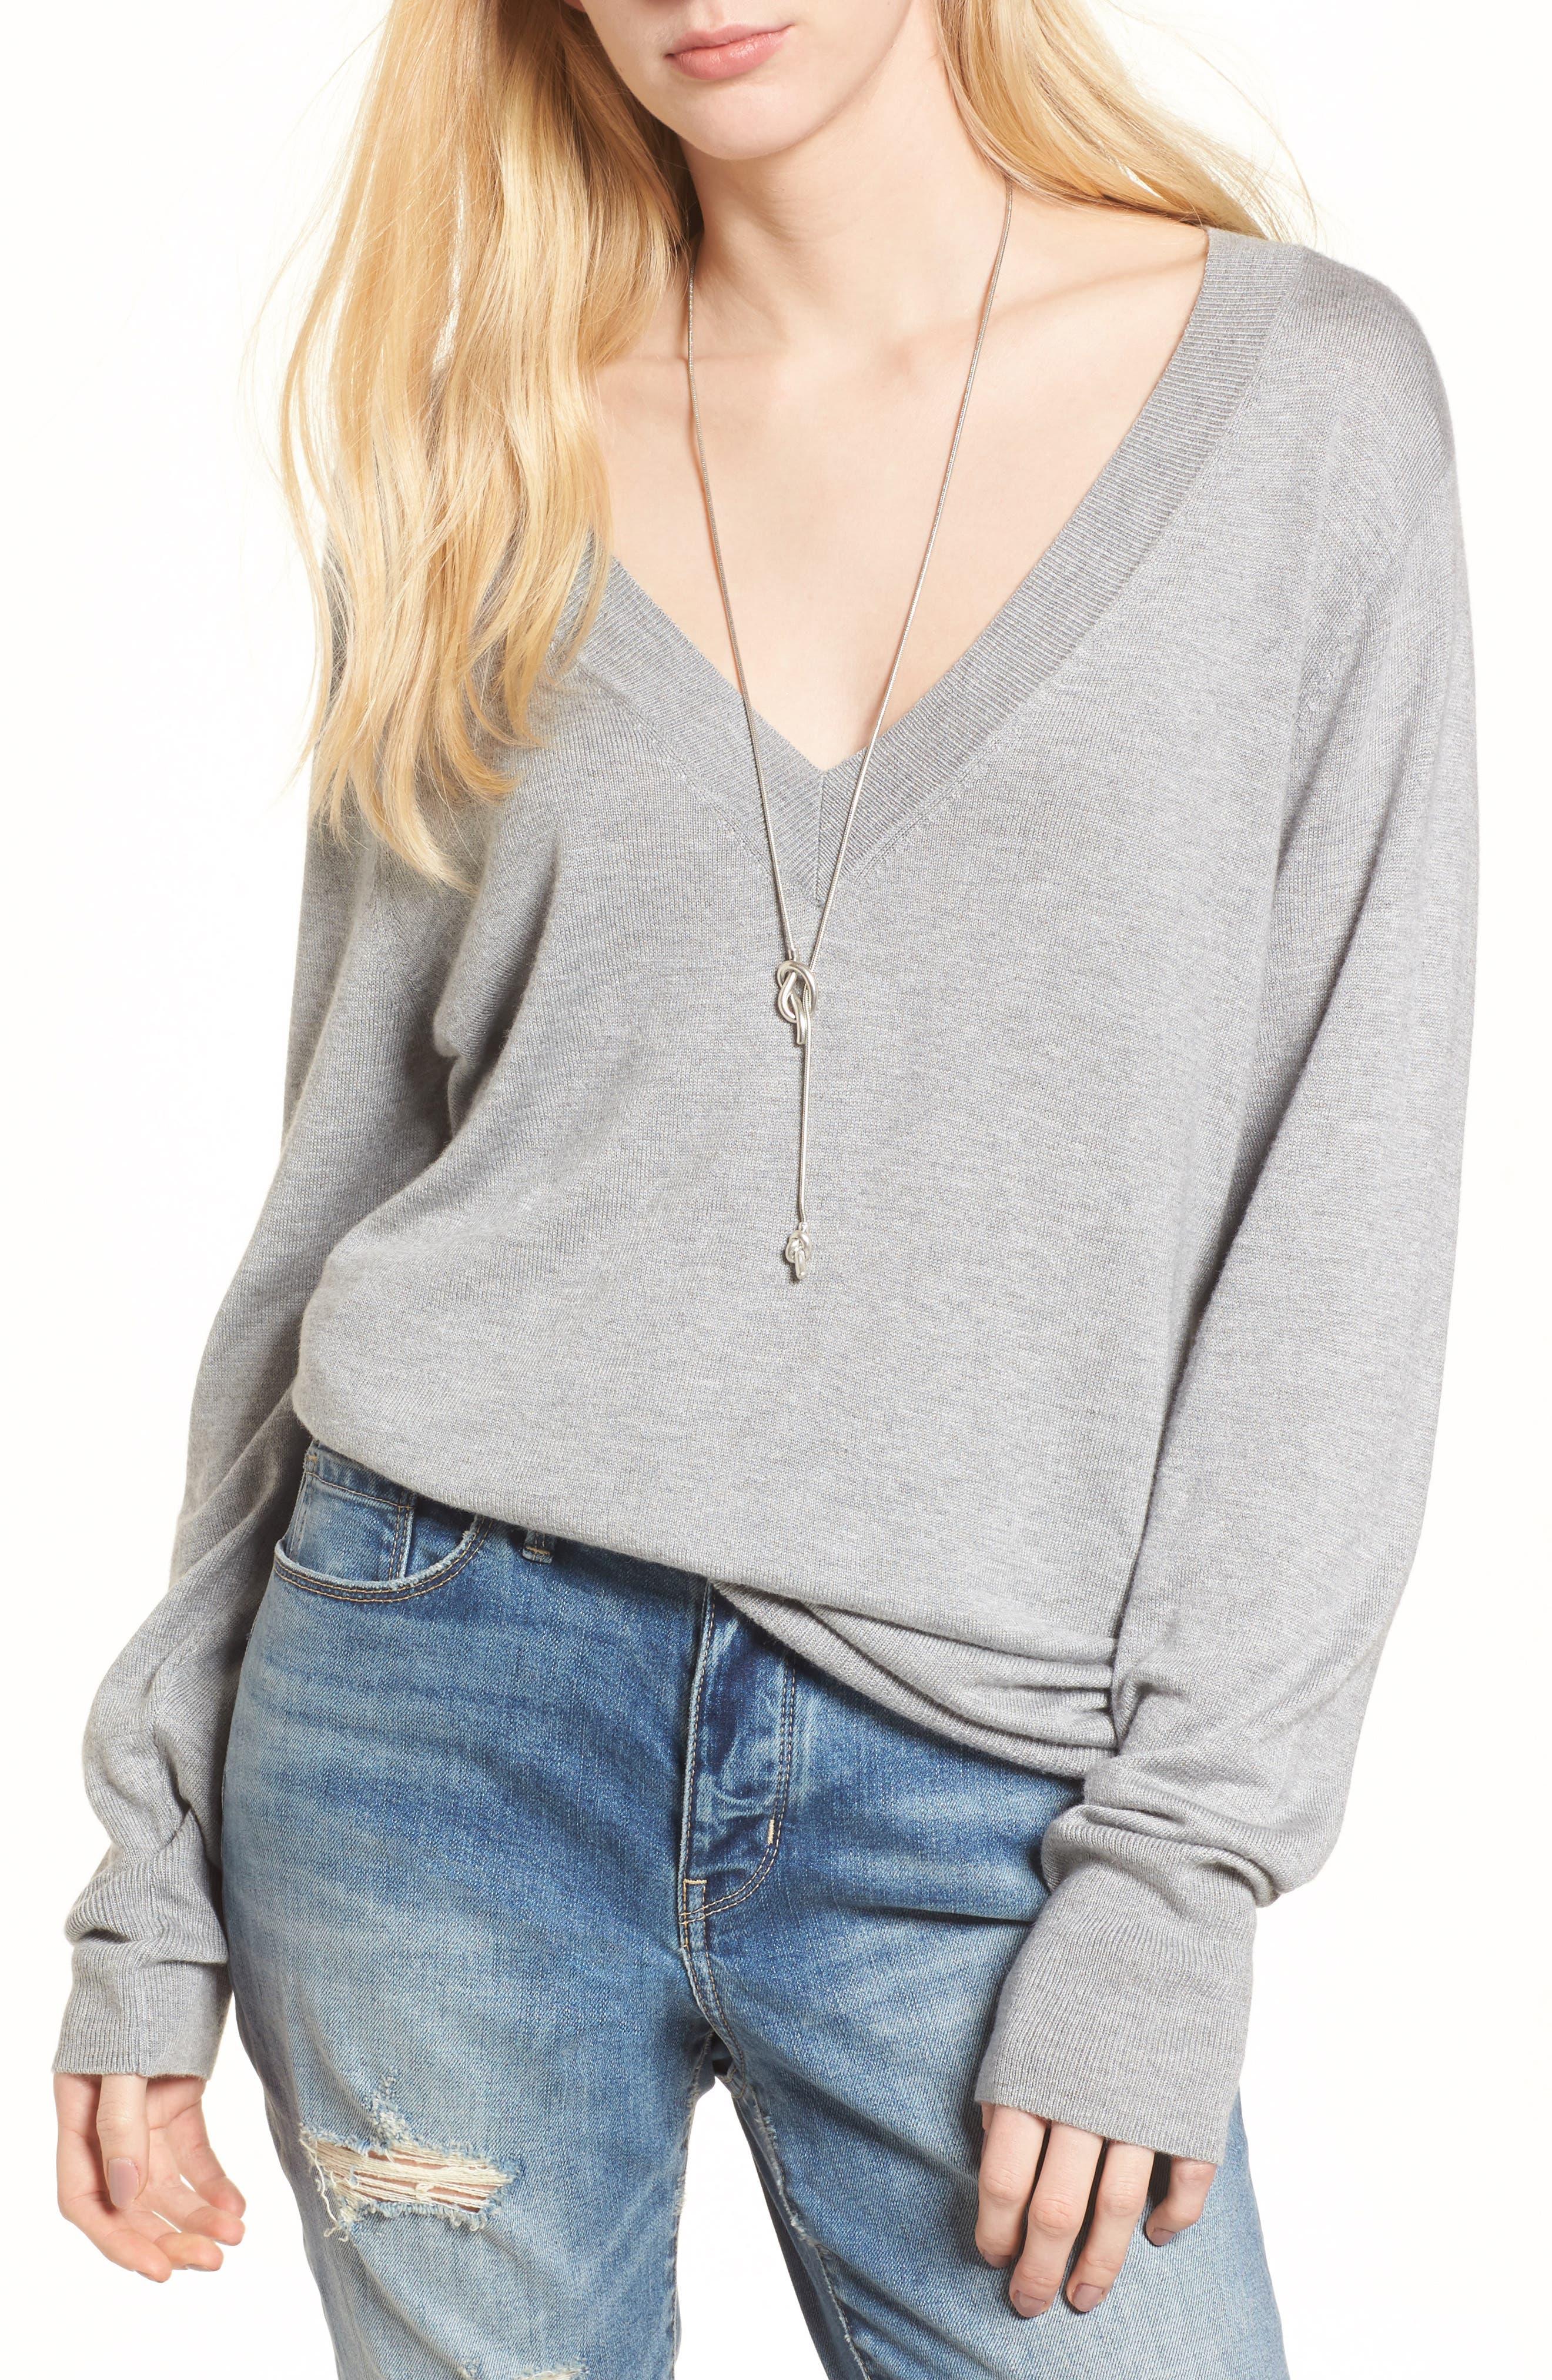 Treasure & Bond Slouchy Sweater